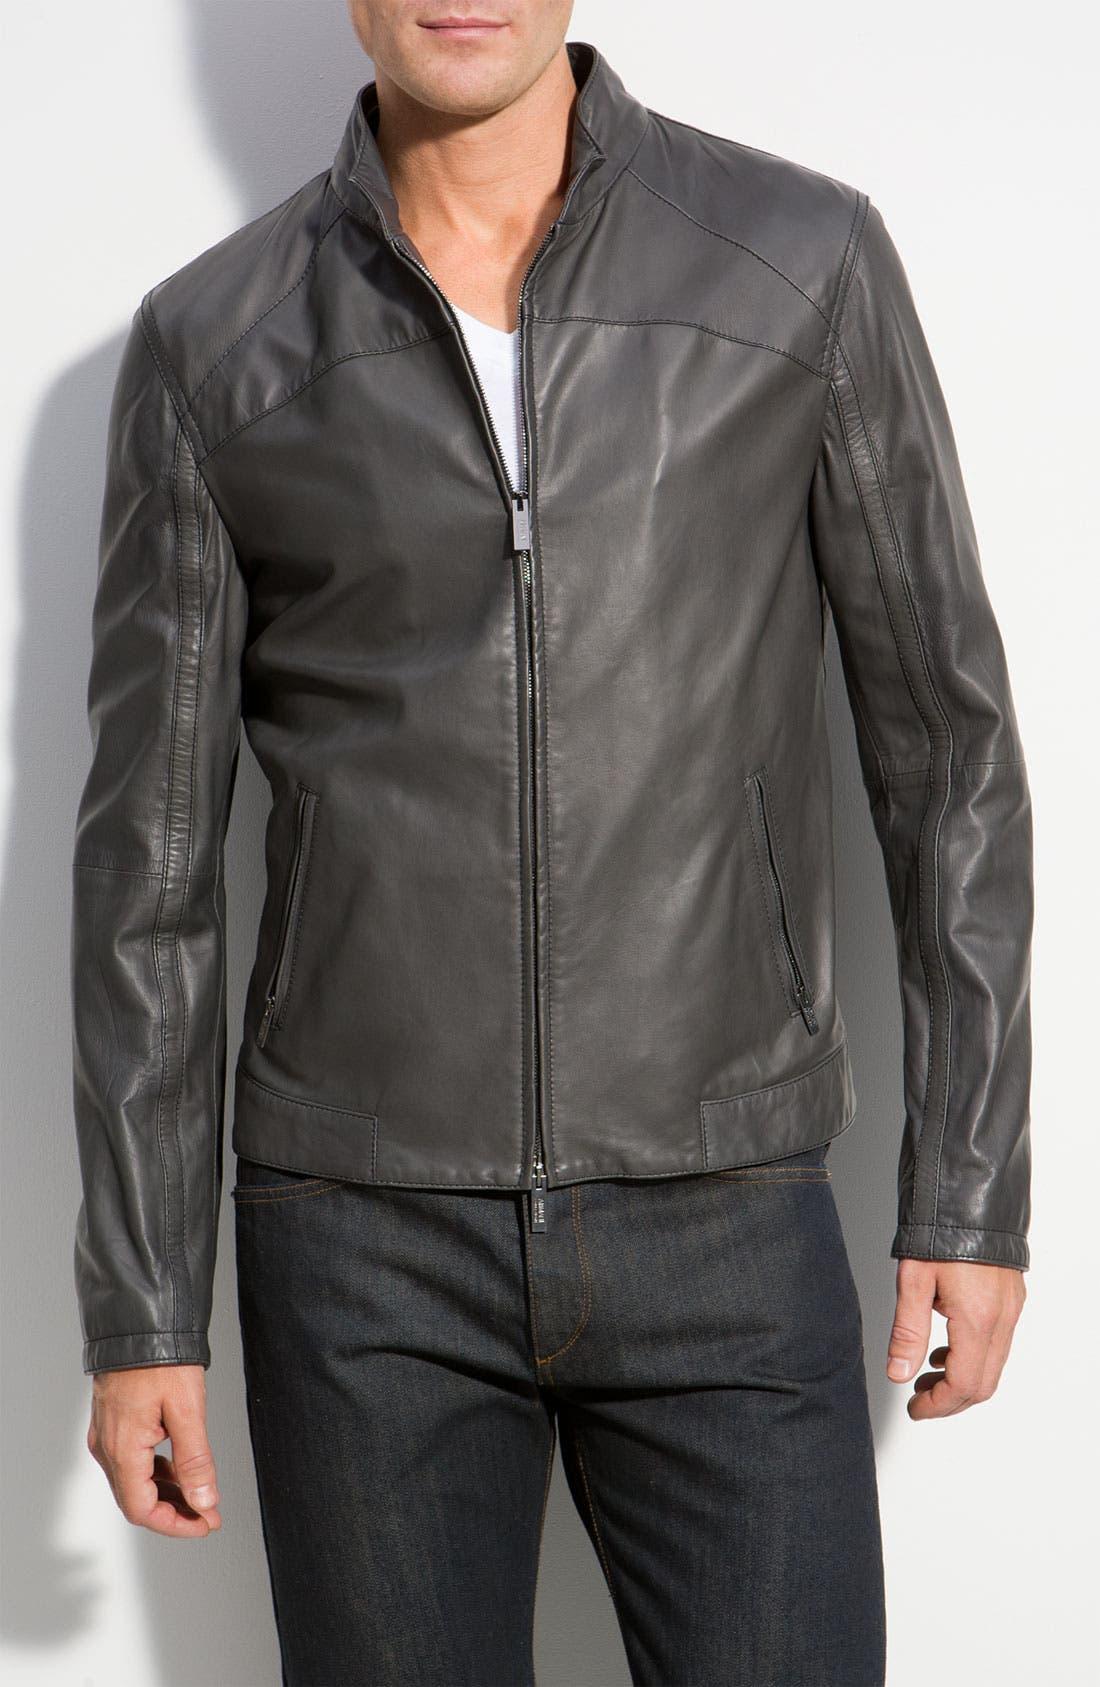 Alternate Image 1 Selected - Armani Collezioni Leather Jacket